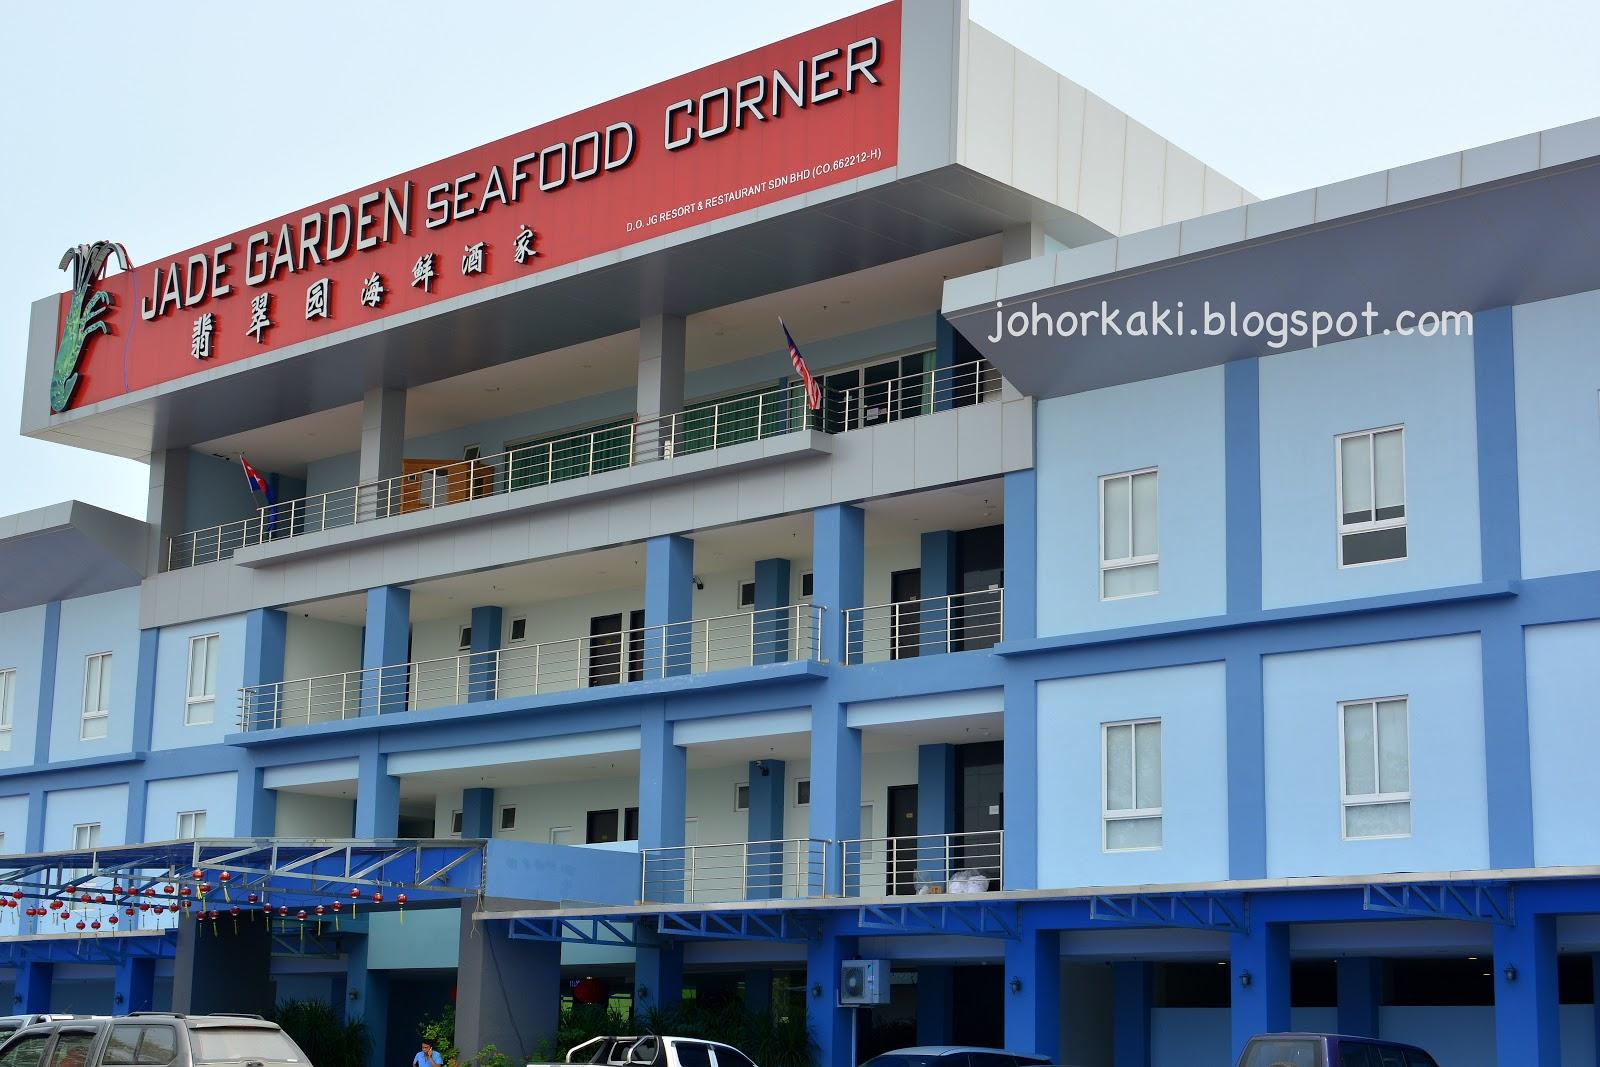 Jade Garden Seafood Restaurant at Sungai Rengit Lobster |Johor Kaki Travels for Food